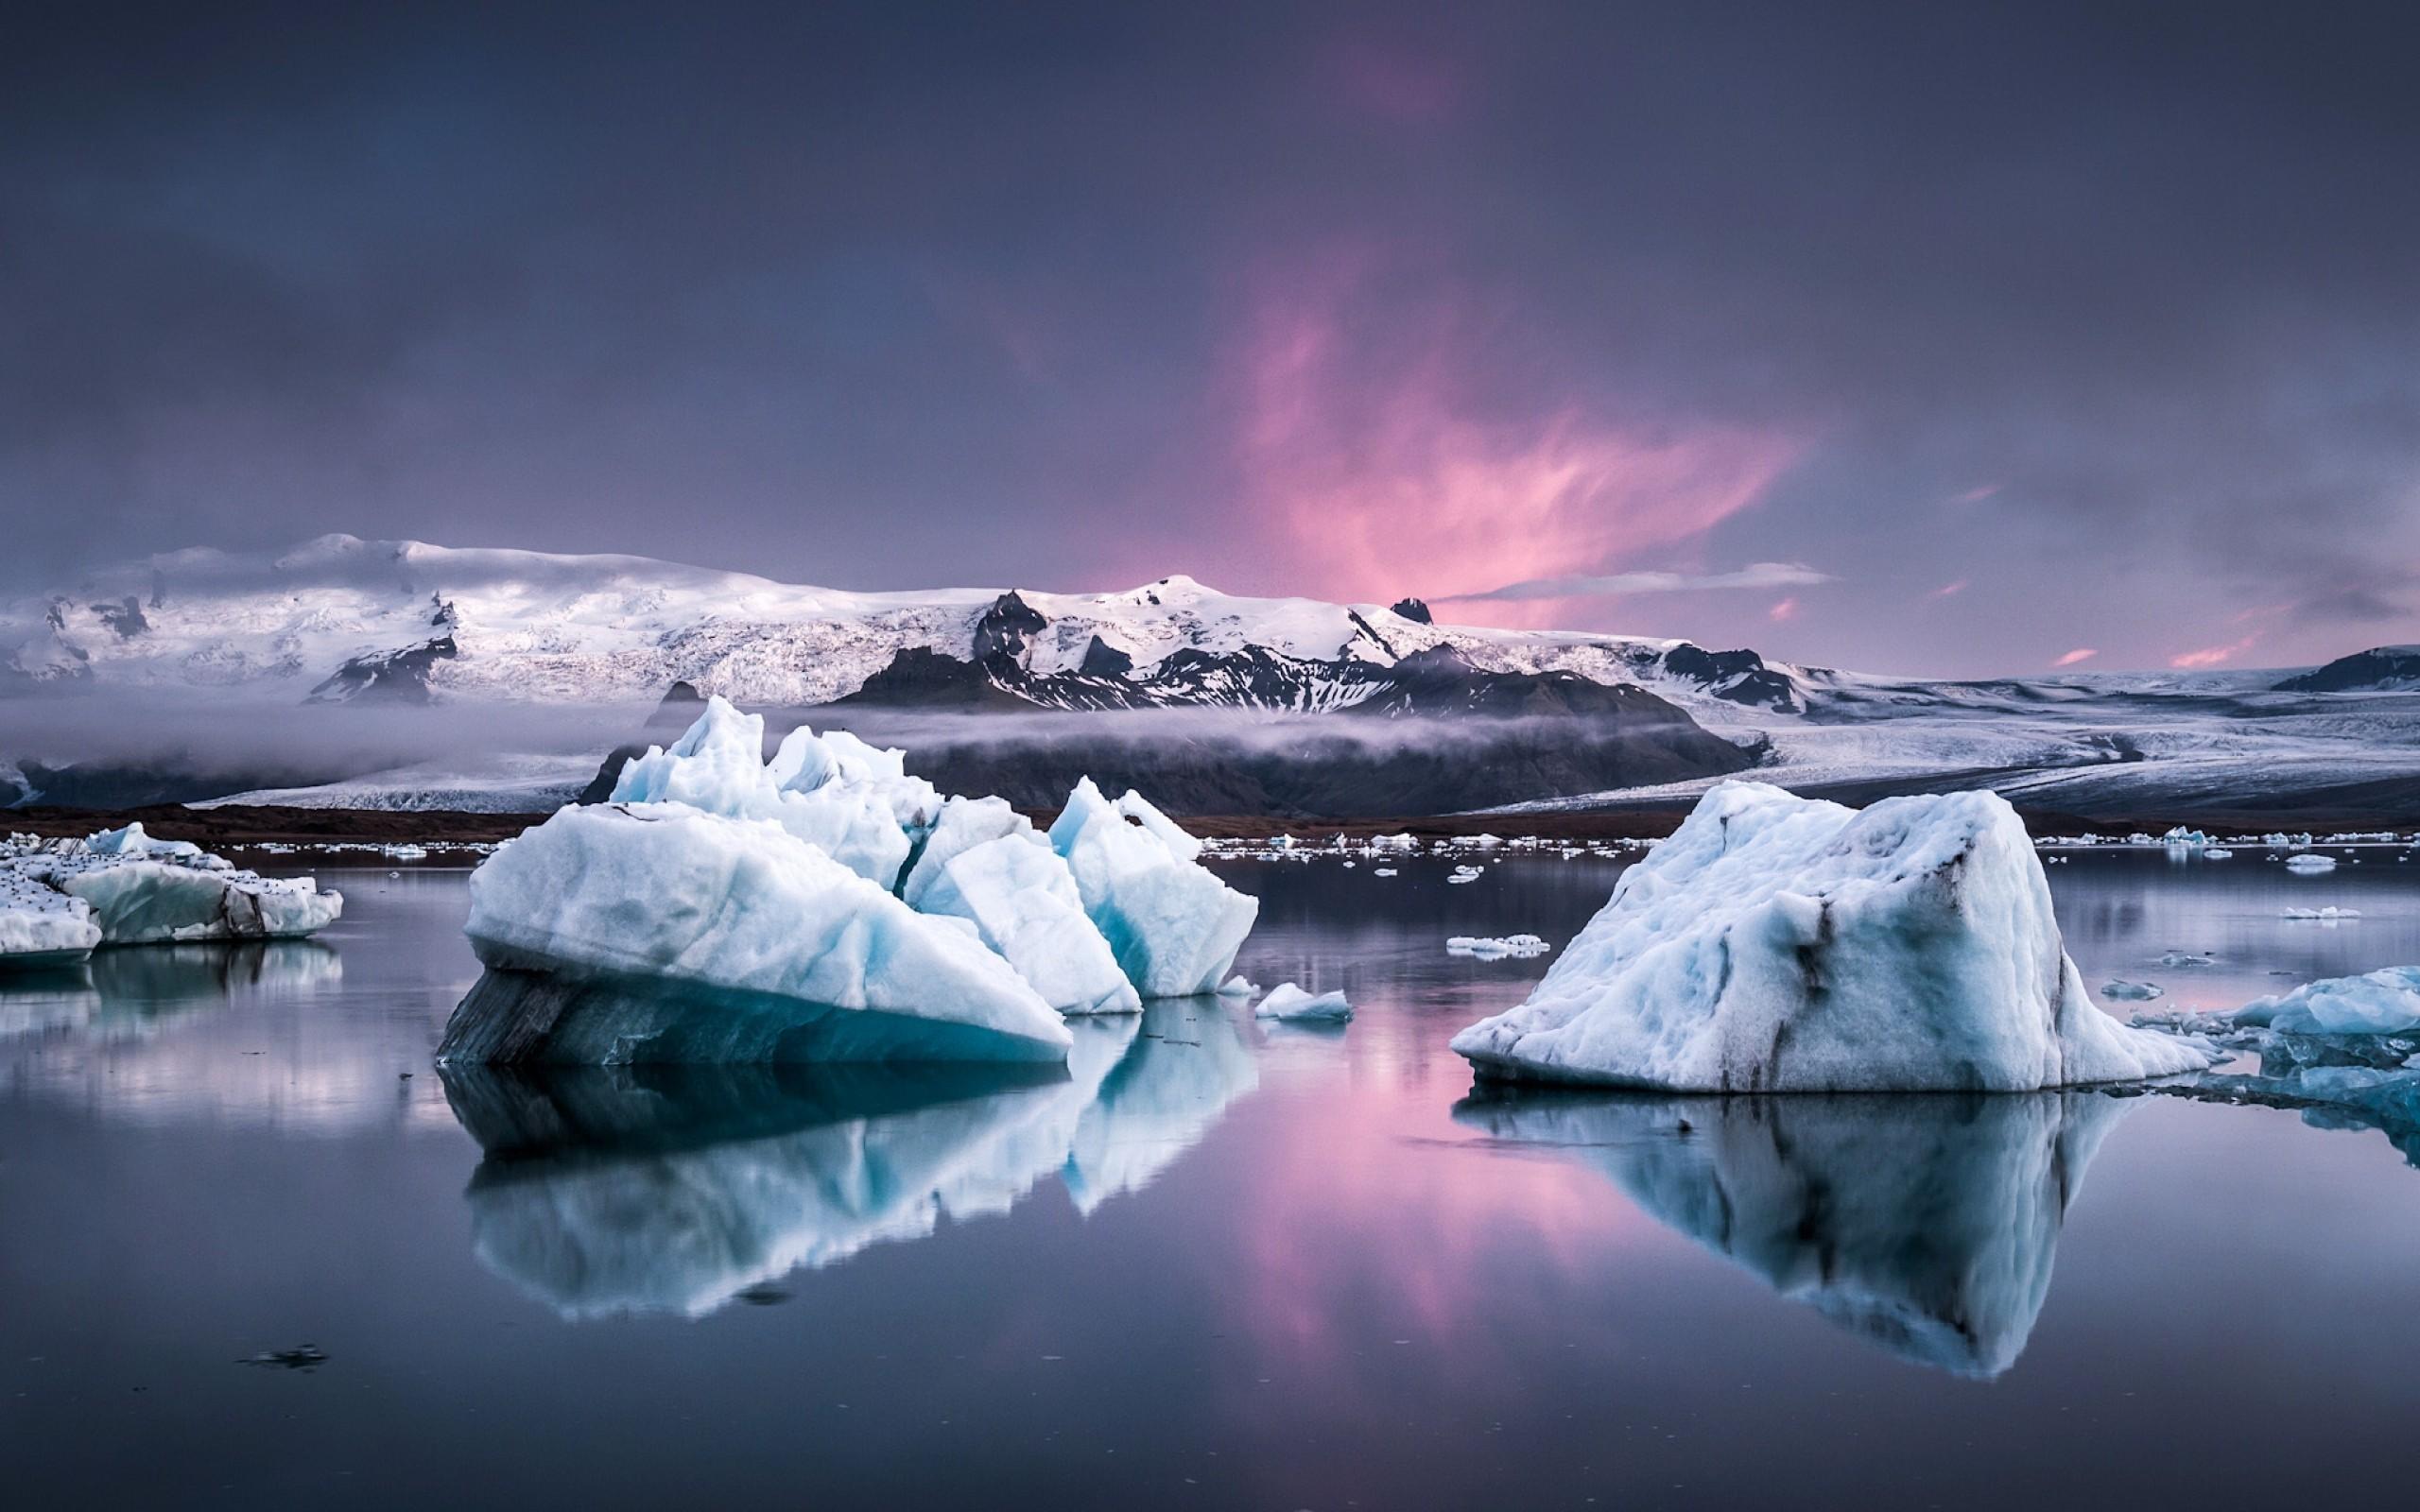 http://extranet.jetlinetravel.info/express-images/express_Europe-Iceland-BlueLagoon-Generic-24.jpg